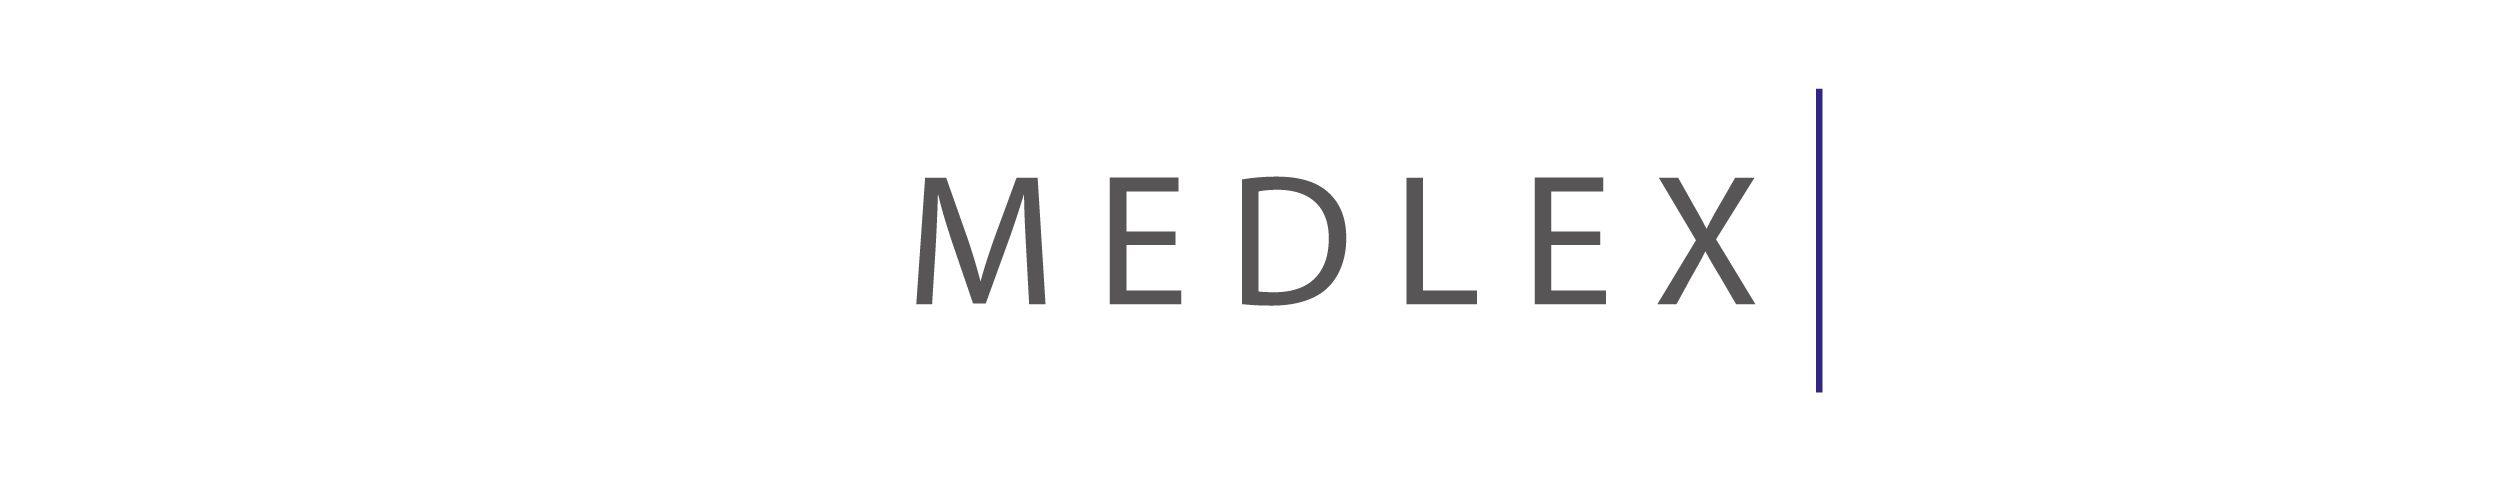 cropped-Medlex-1.jpg